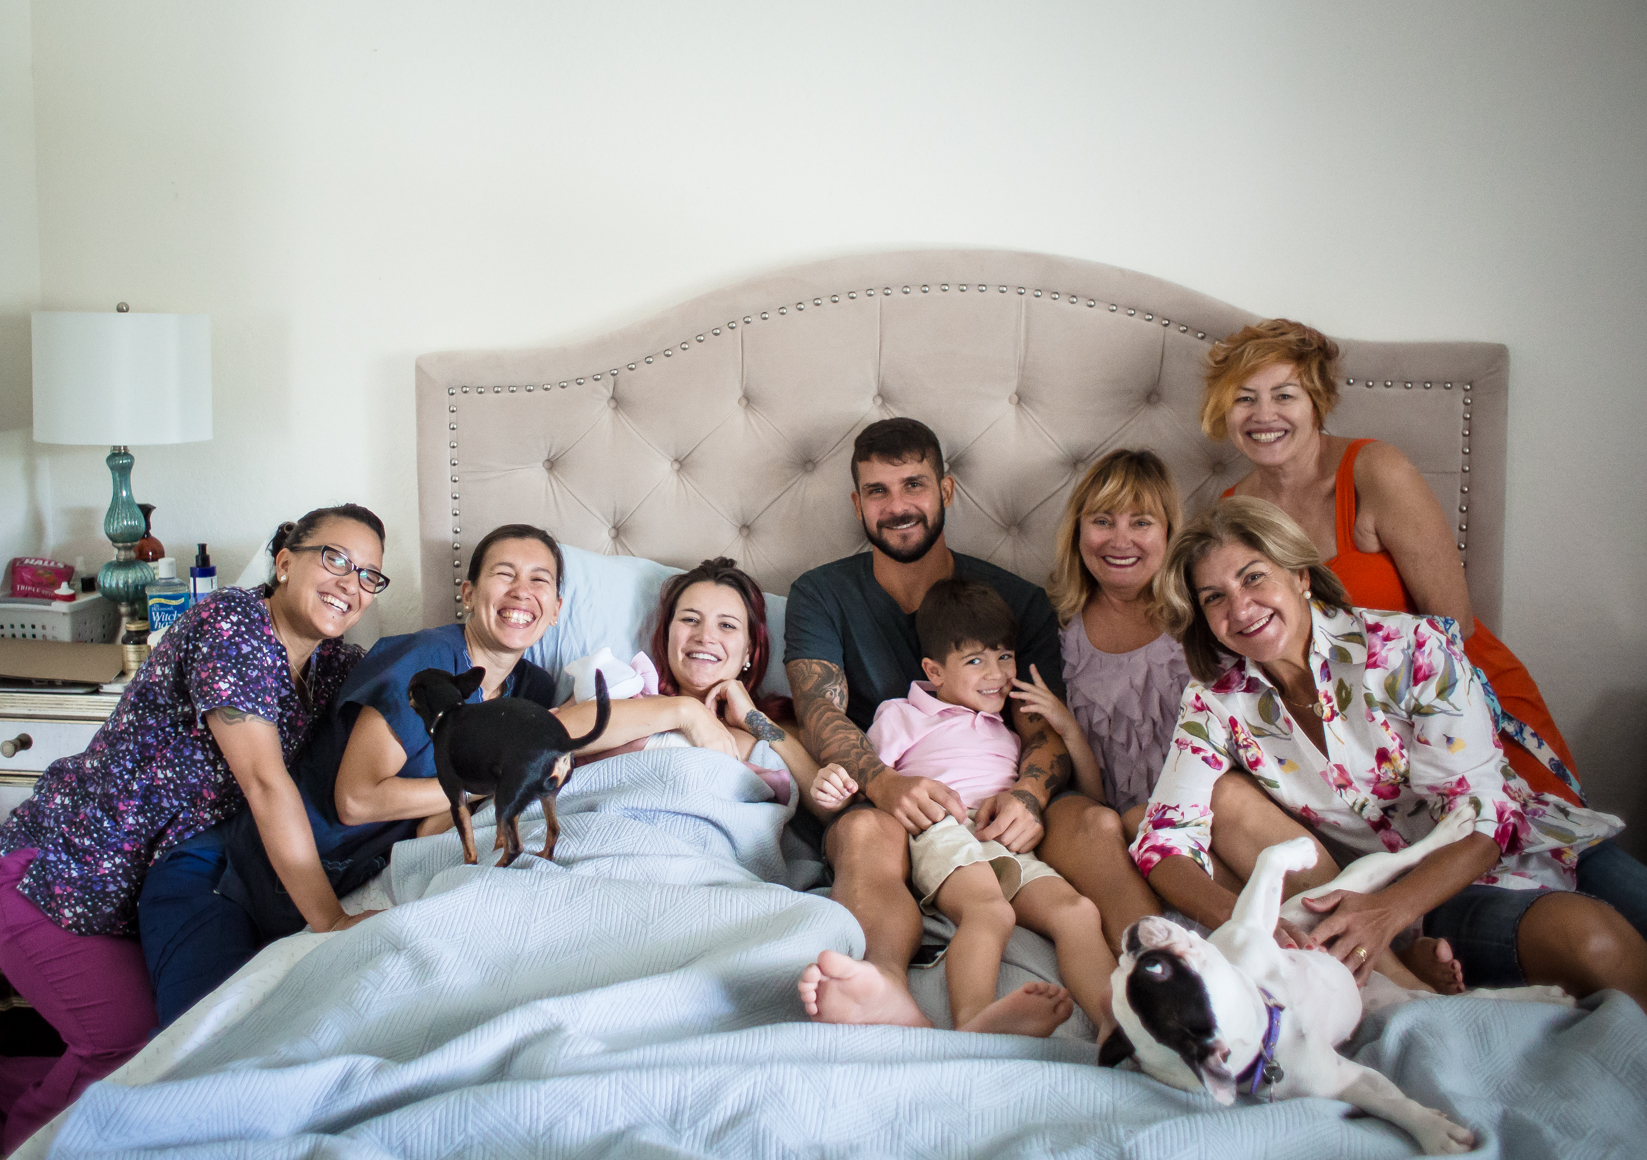 midwife-birth-center-delray-beach-boca-palm-beach-margate-ft-lauderdale-home-boca-regional-csmc--18.jpg